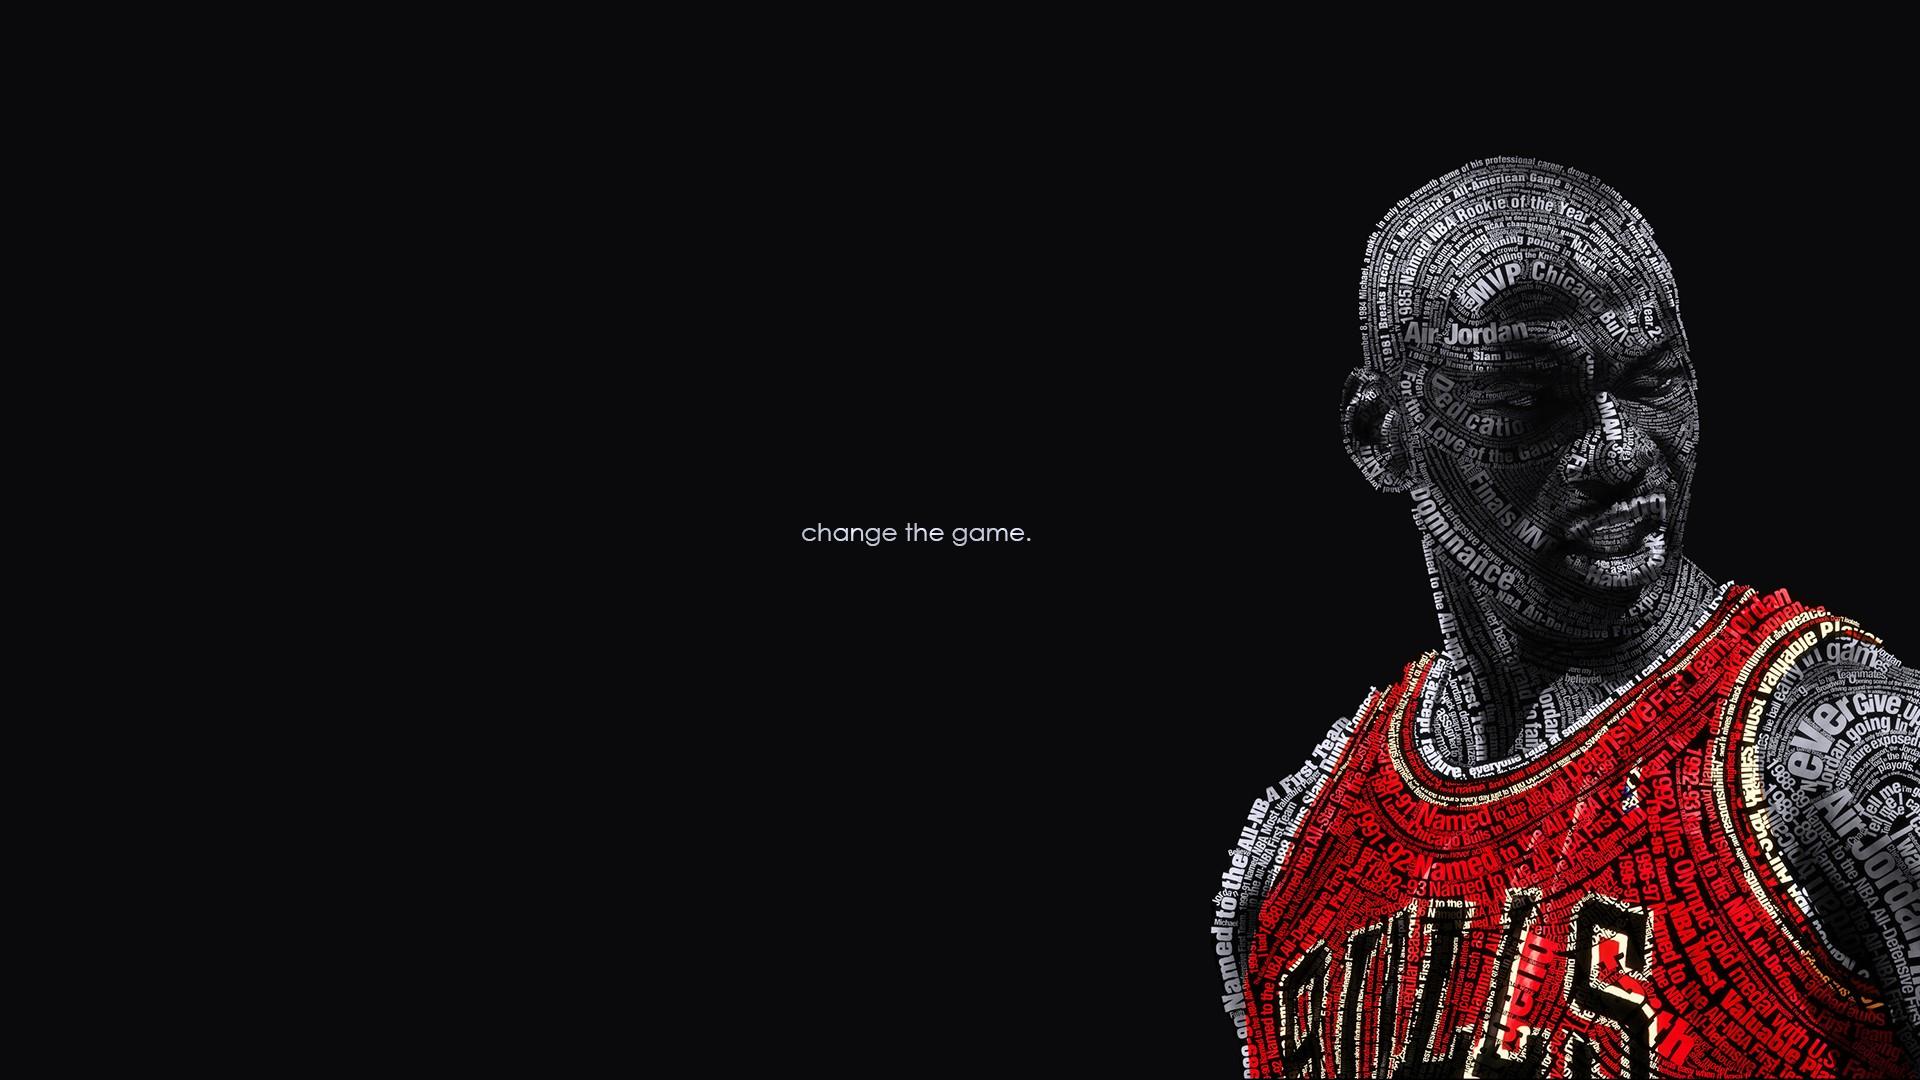 Mobile Phone Basketball Wallpapers Hd Desktop Backgrounds 1920x1080